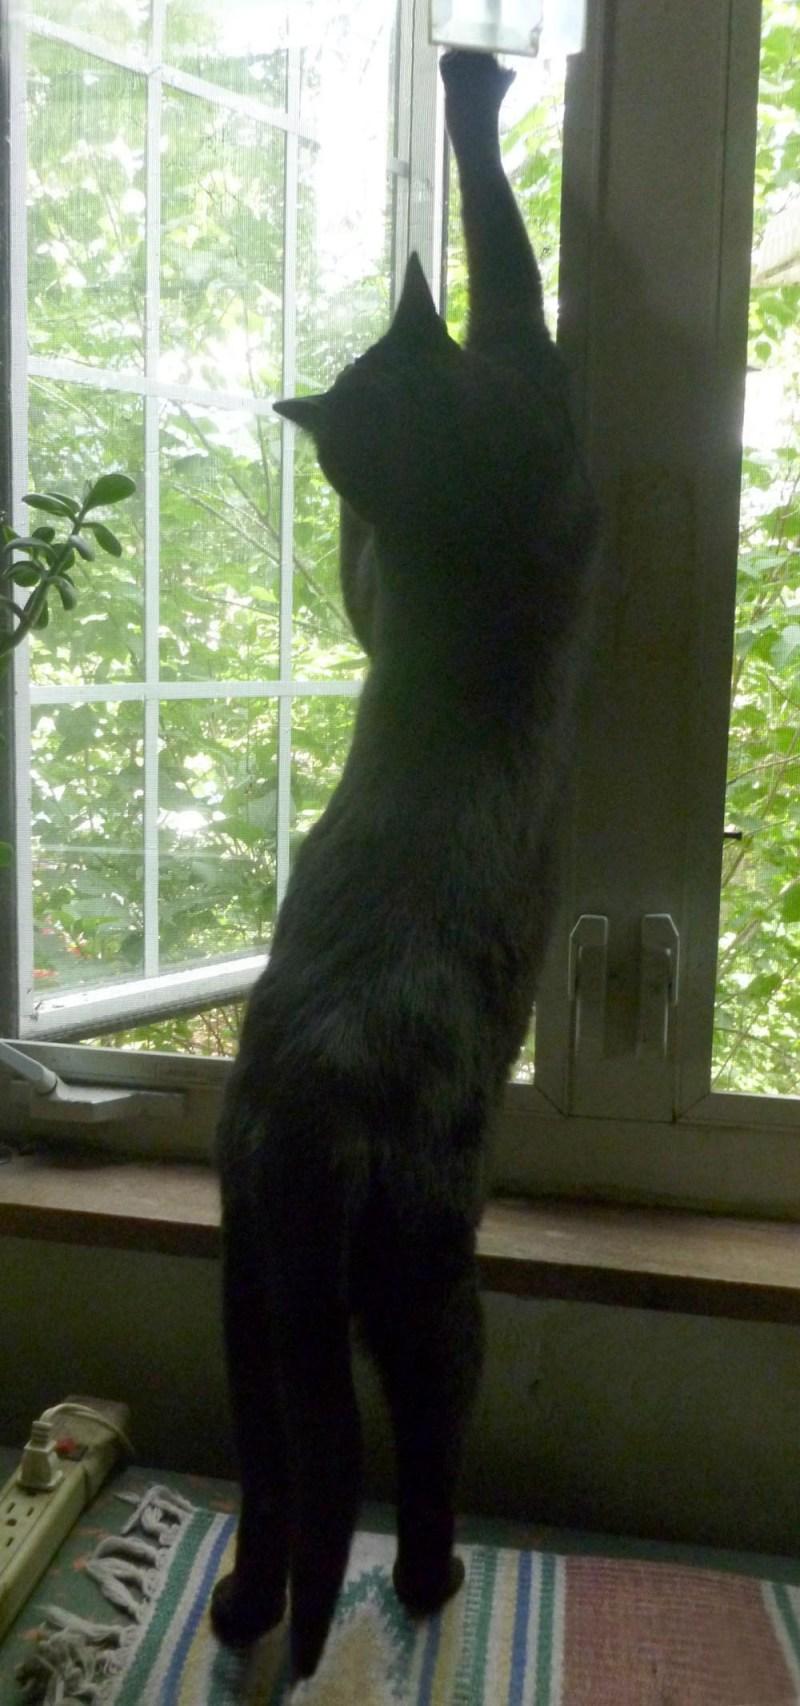 black cat stretching on window